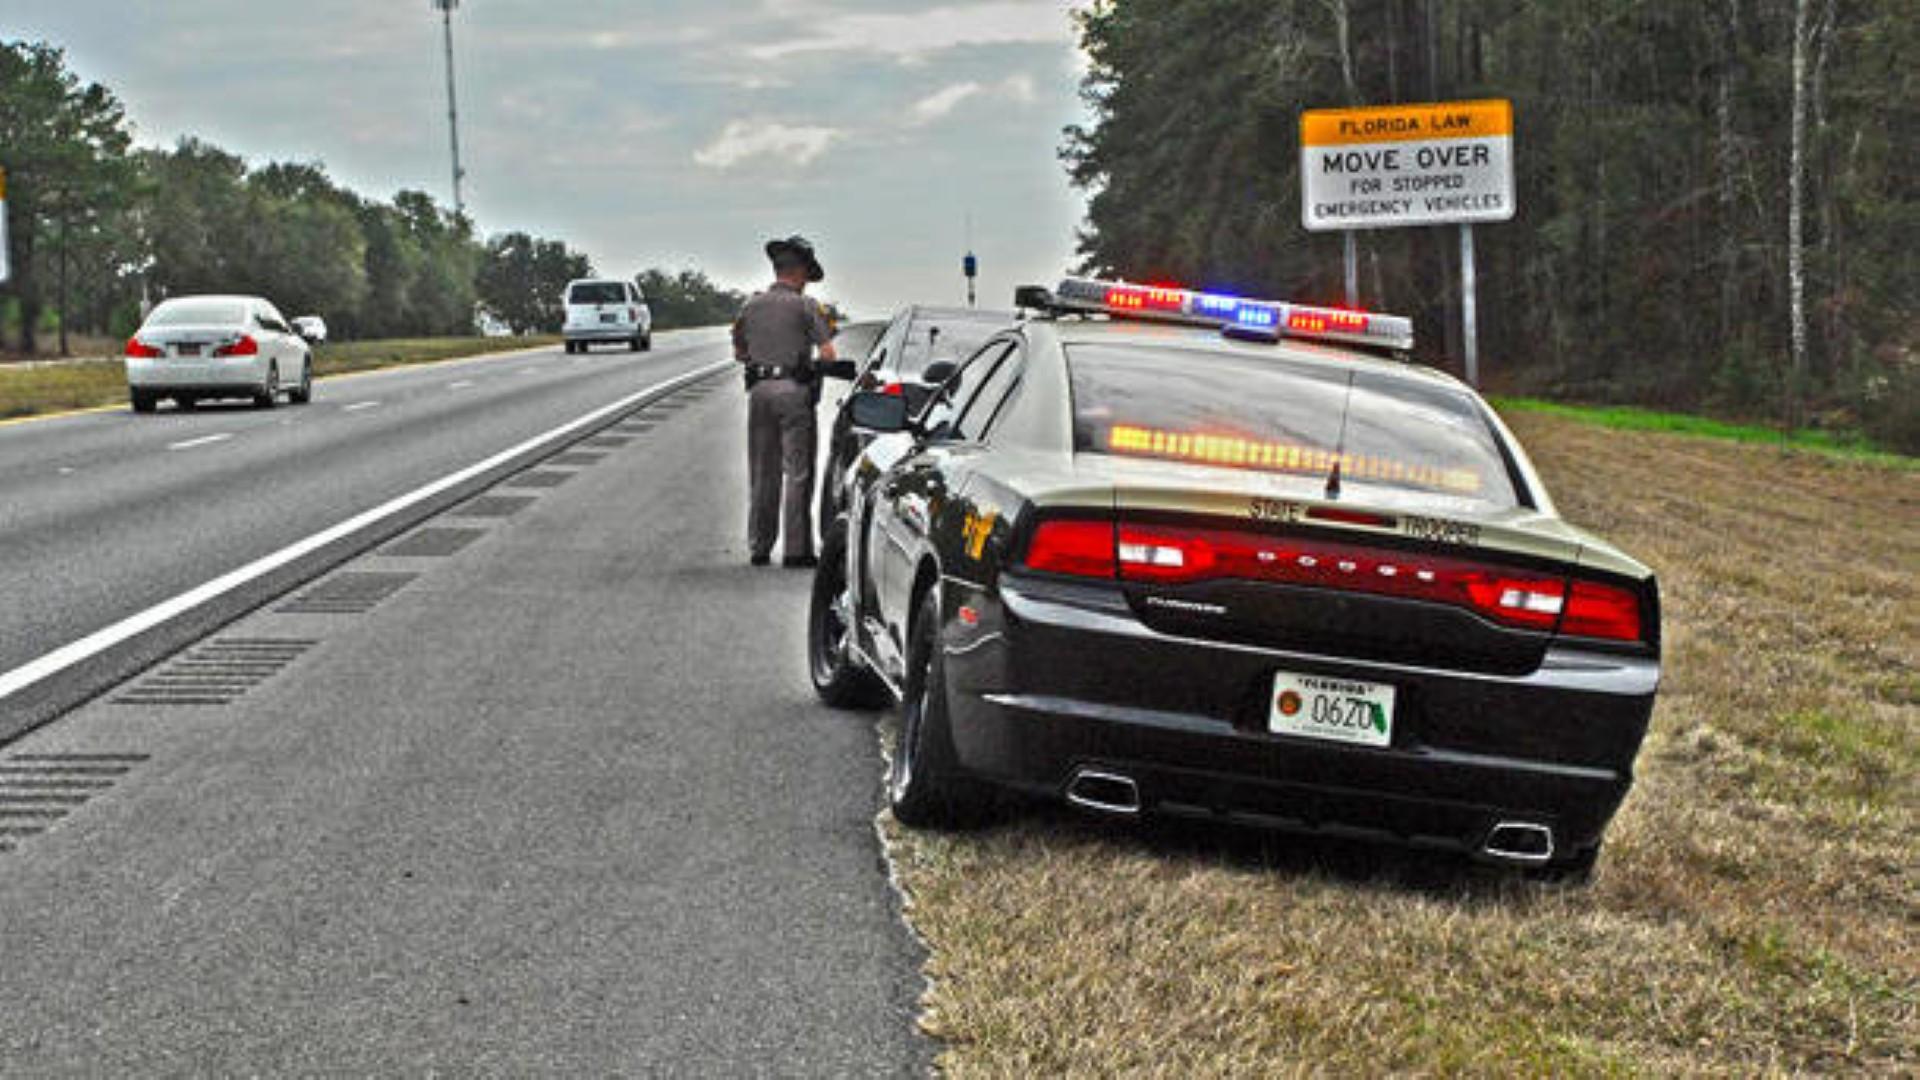 Florida Highway Patrol Traffic >> Ticketed Another Florida Highway Patrol Official Resigns Florida